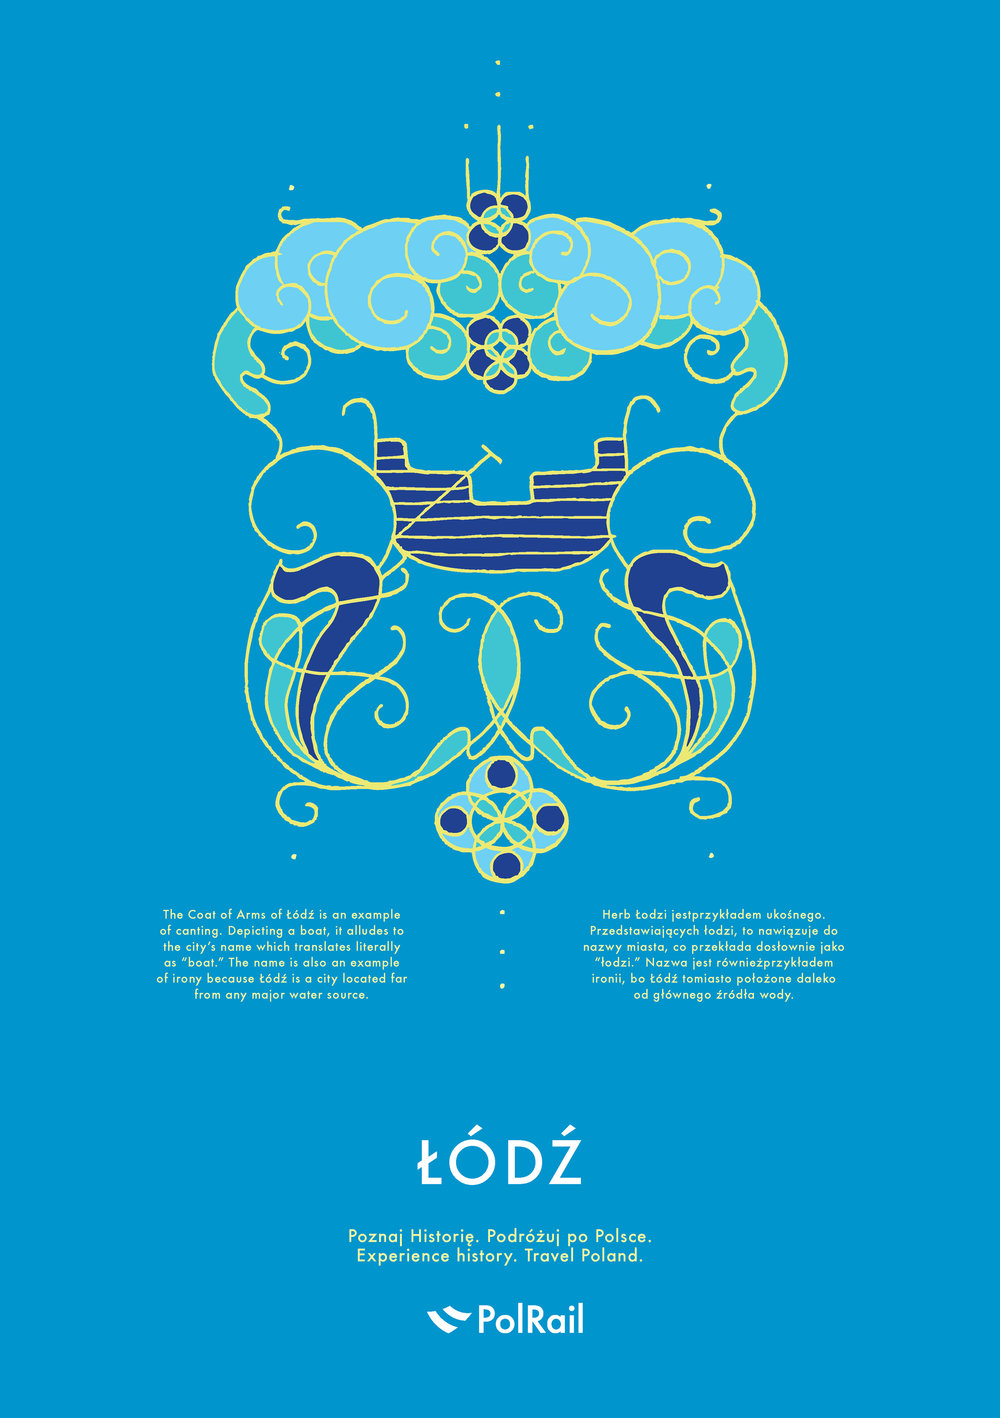 polrail-posters-lodz.jpg